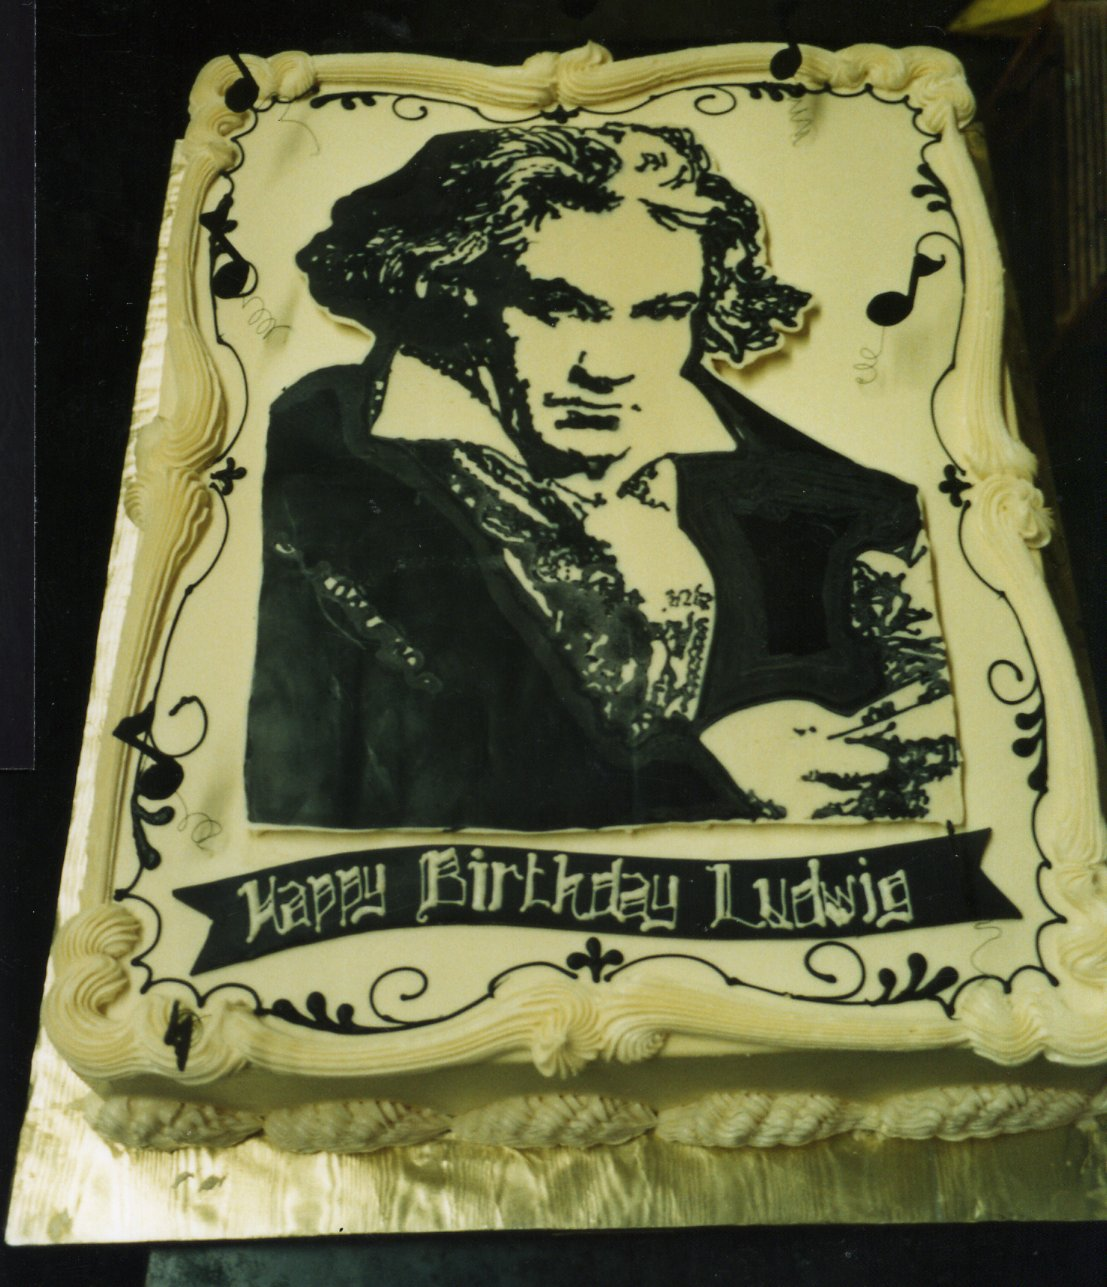 Beethoven's birthday cake